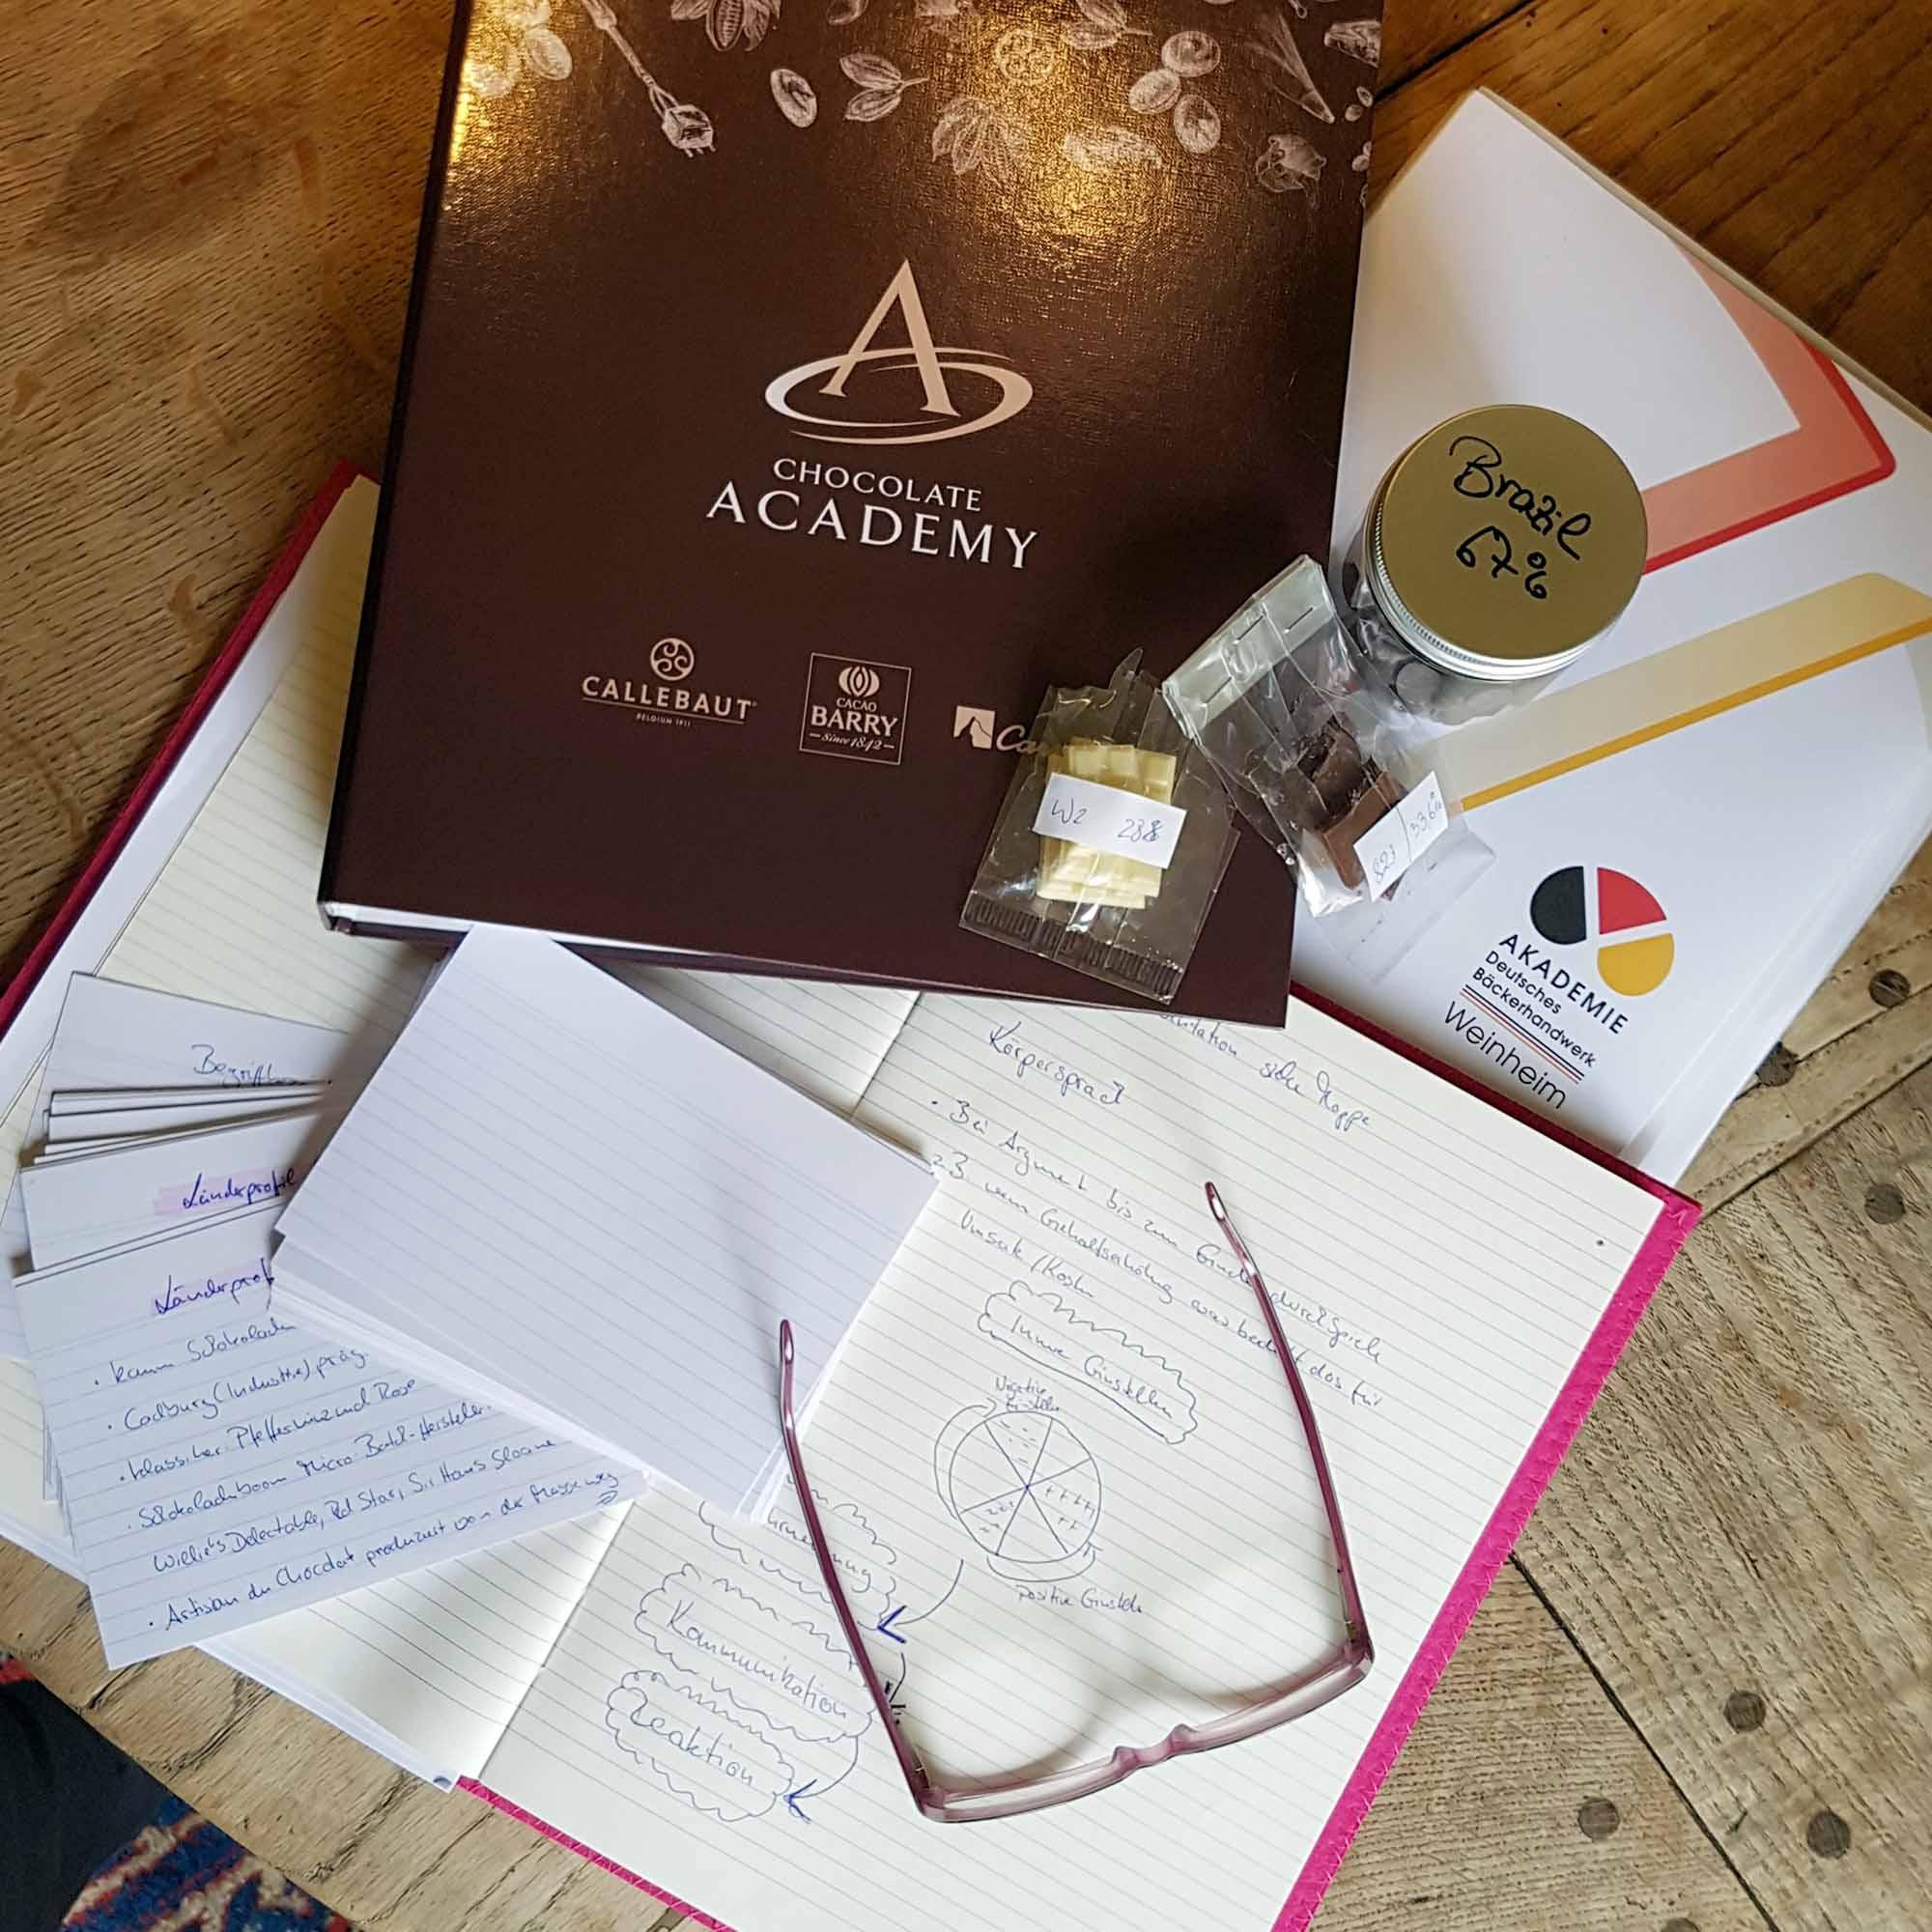 Betty - Endspurt in Richtung Schokoladen-Sommelière - Lernen, lernen, lernen